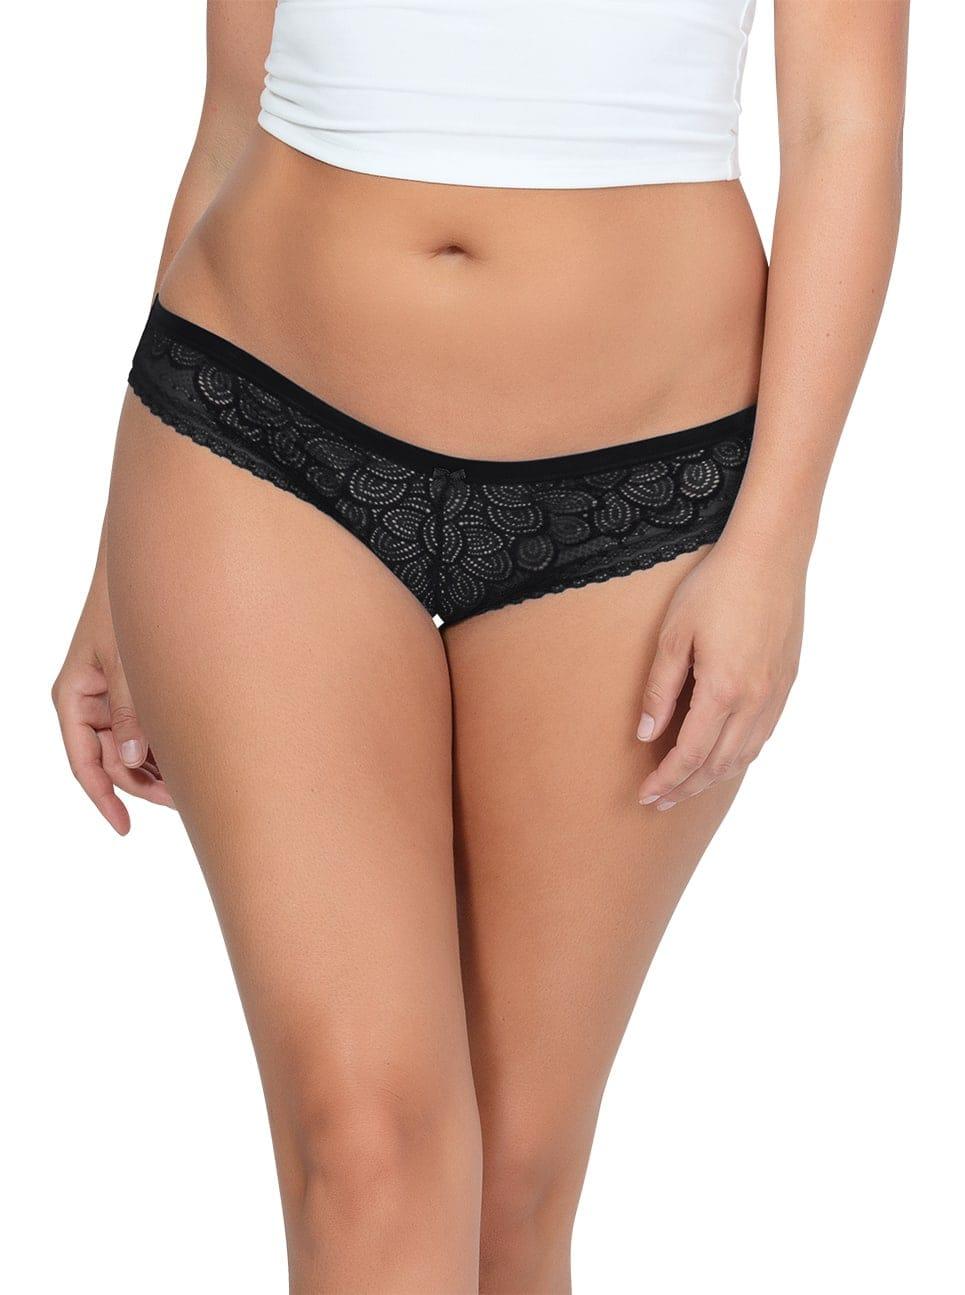 ParfaitPanty SoGlam BikiniPP302 Black front - Panty So Glam Bikini - Black - PP302